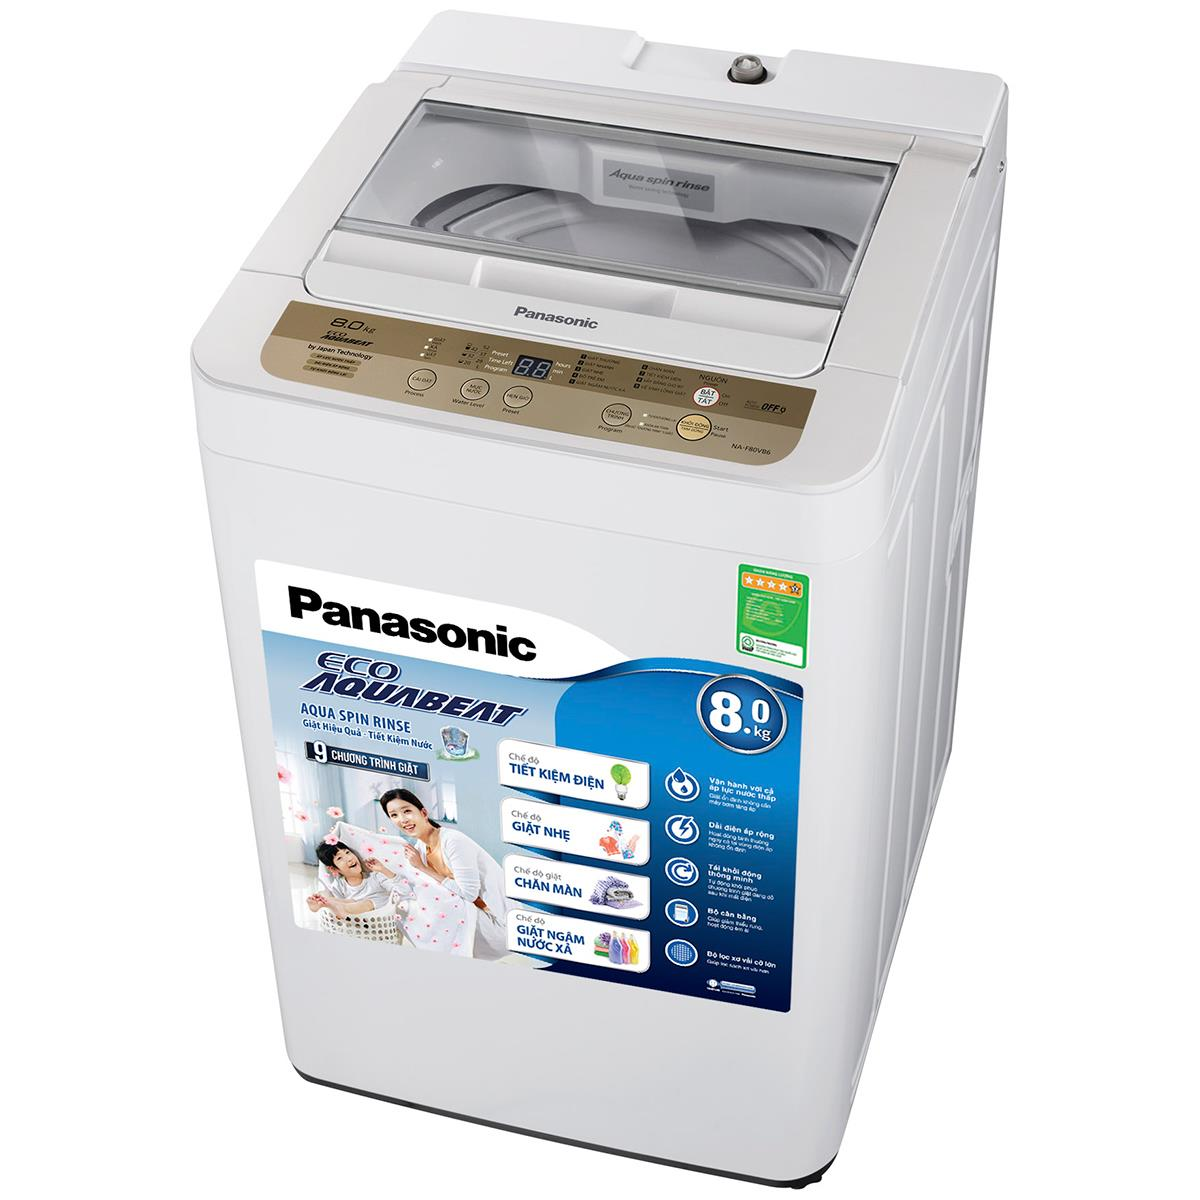 Mua máy giặt panasonic